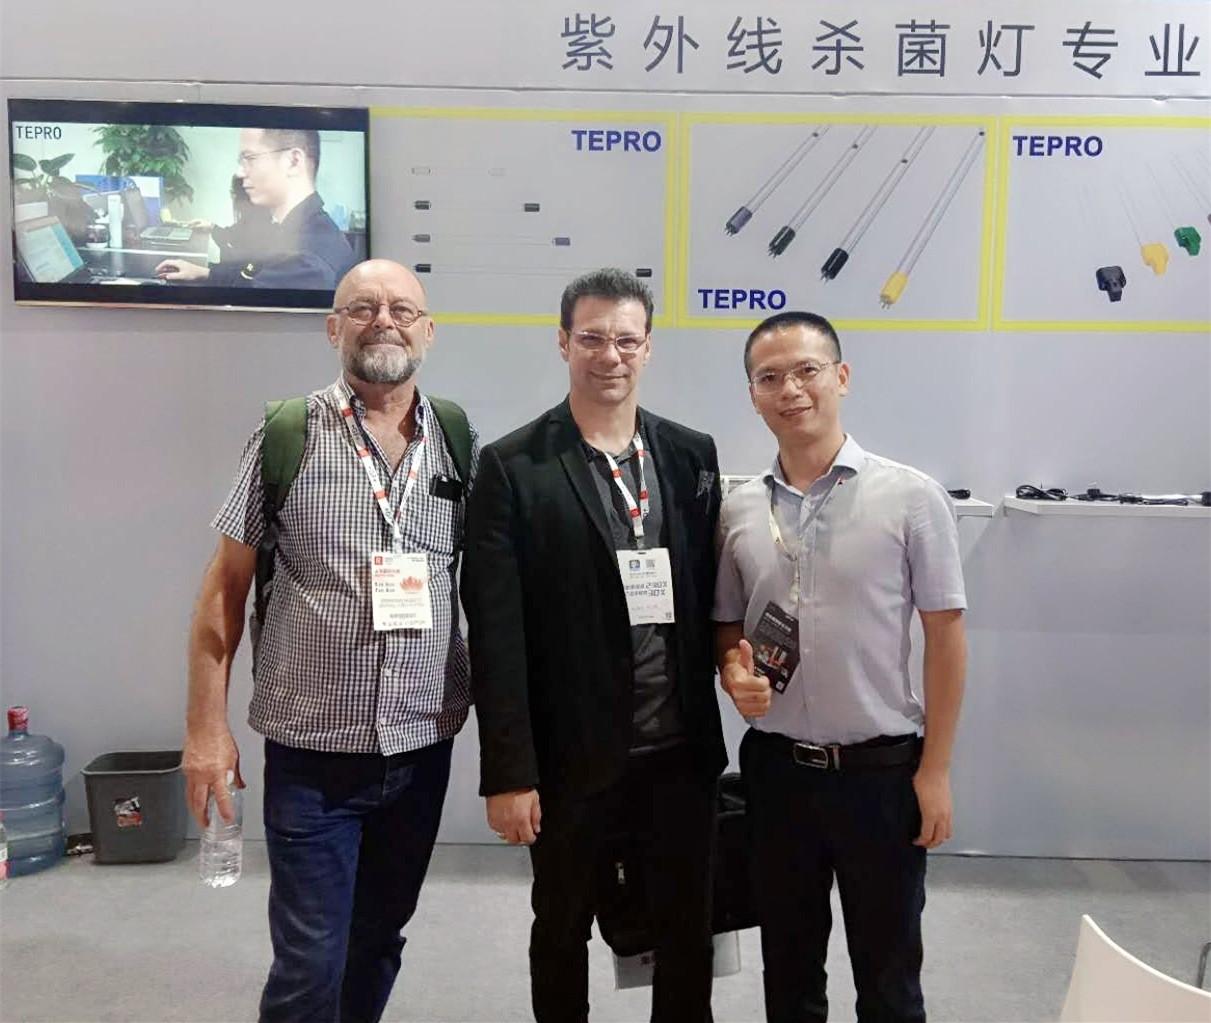 Tepro-Aquatech China Environment 2019 In Shanghai, Tepro china Co, Ltd